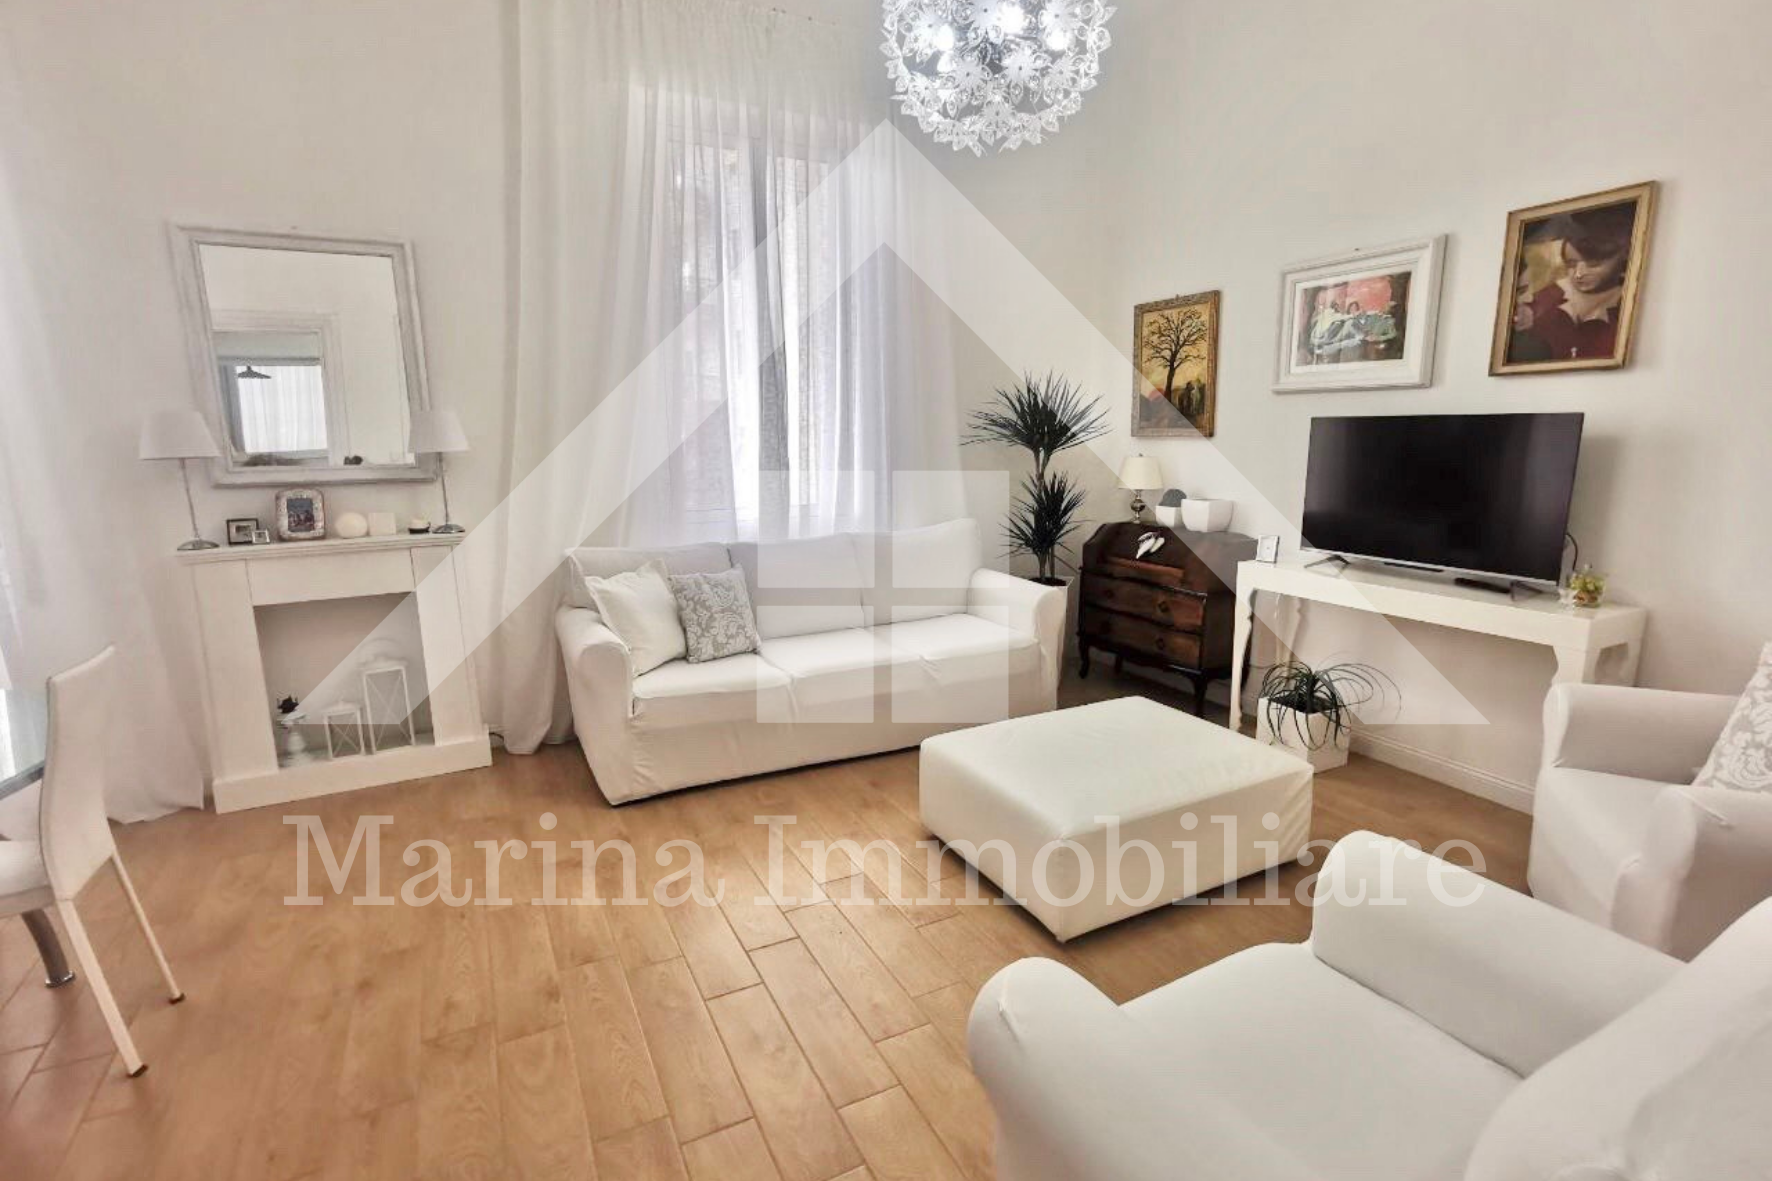 2 bedroom apartment in Oneglia